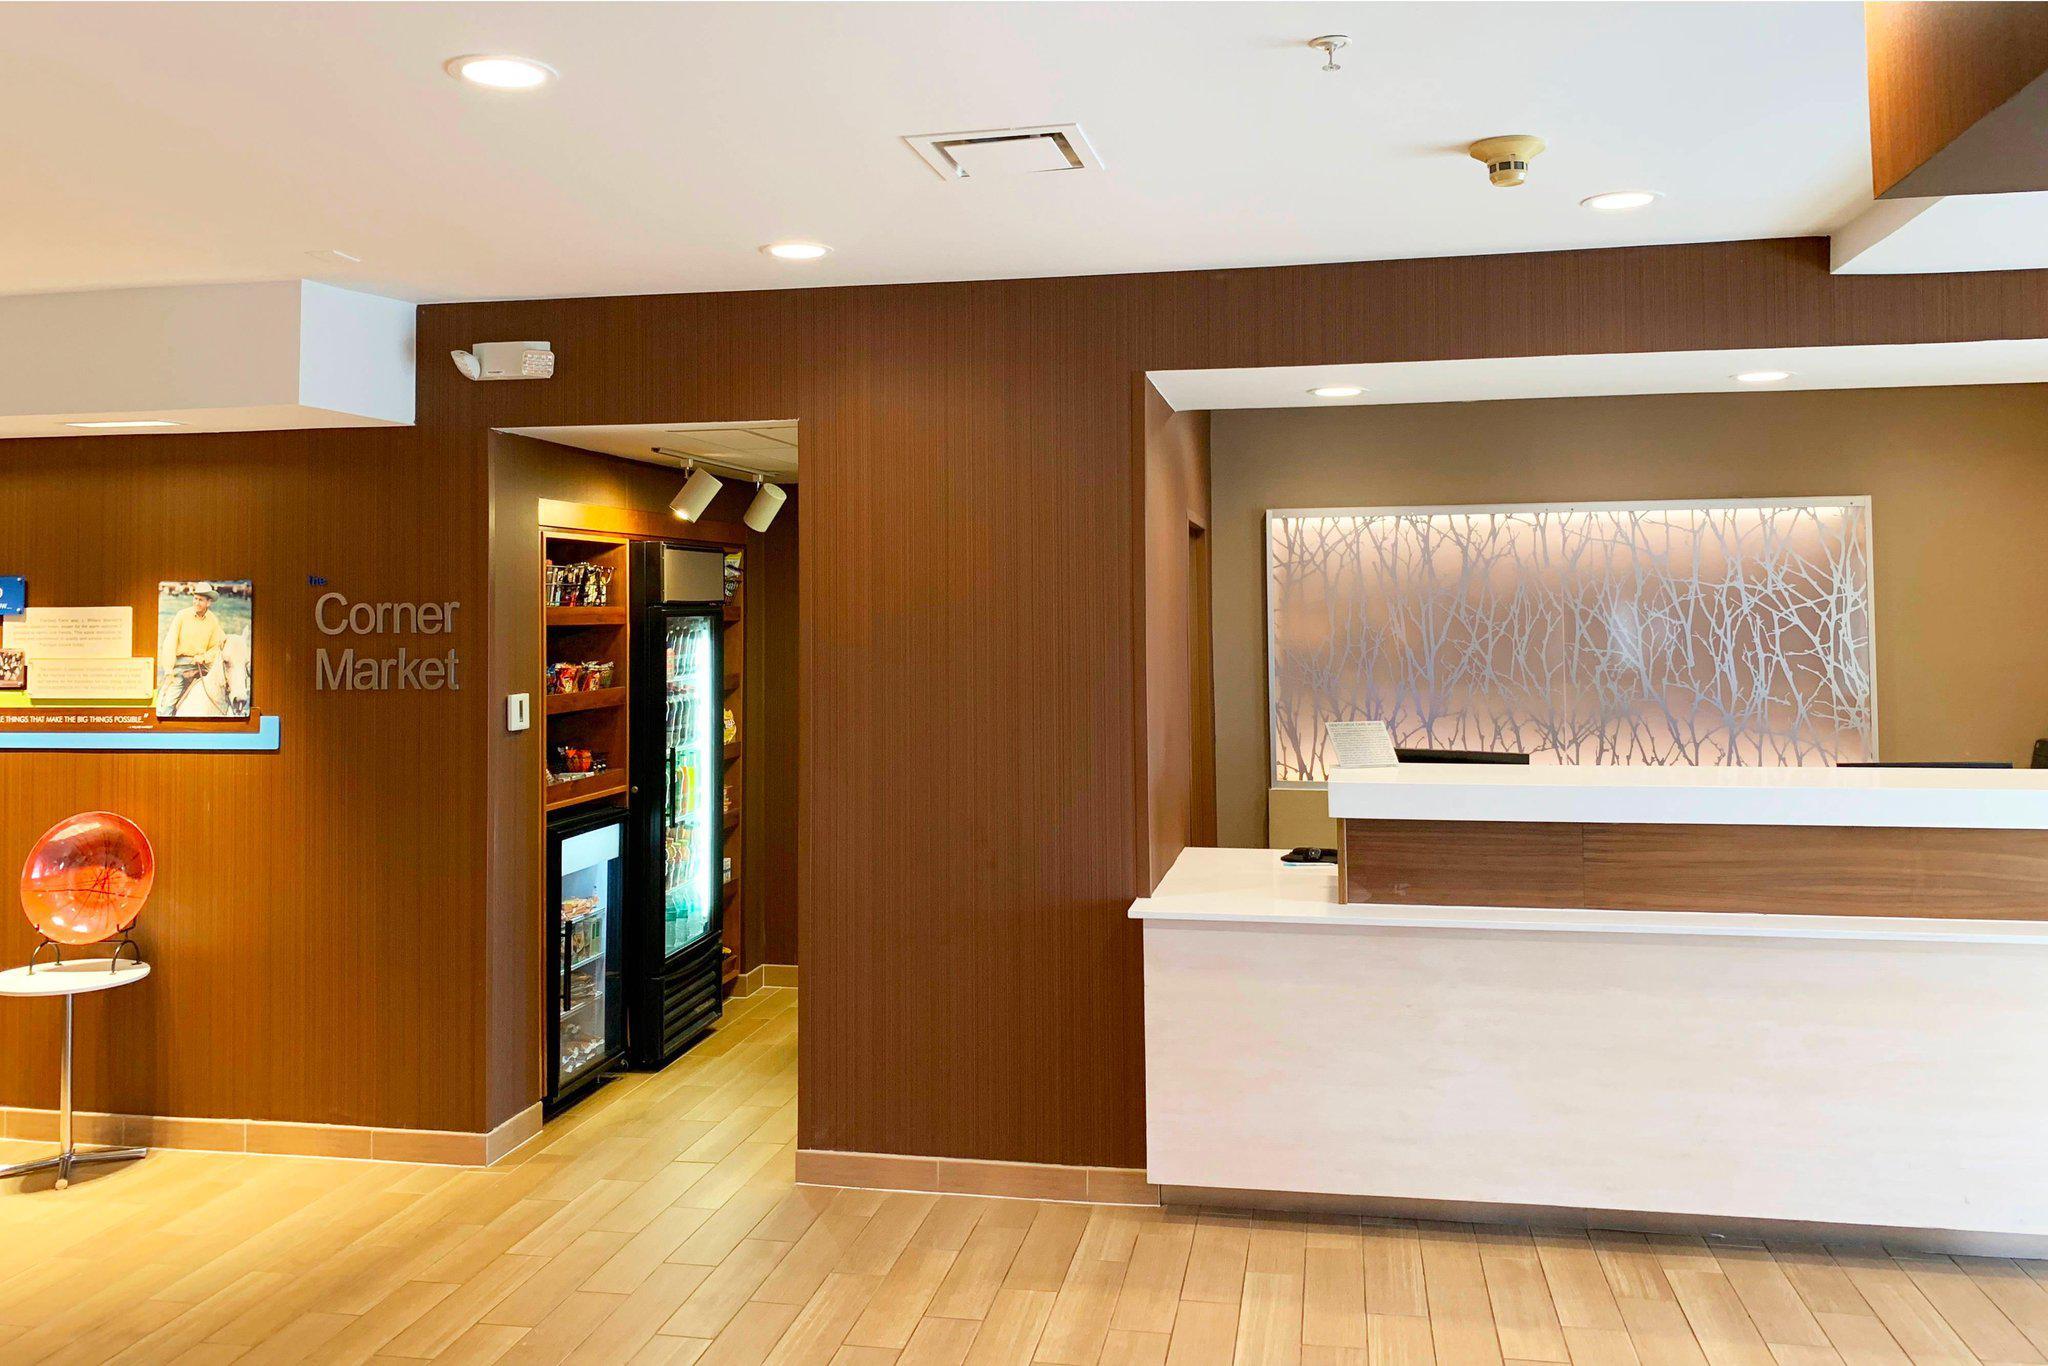 Fairfield Inn & Suites by Marriott Denver Aurora/Medical Center